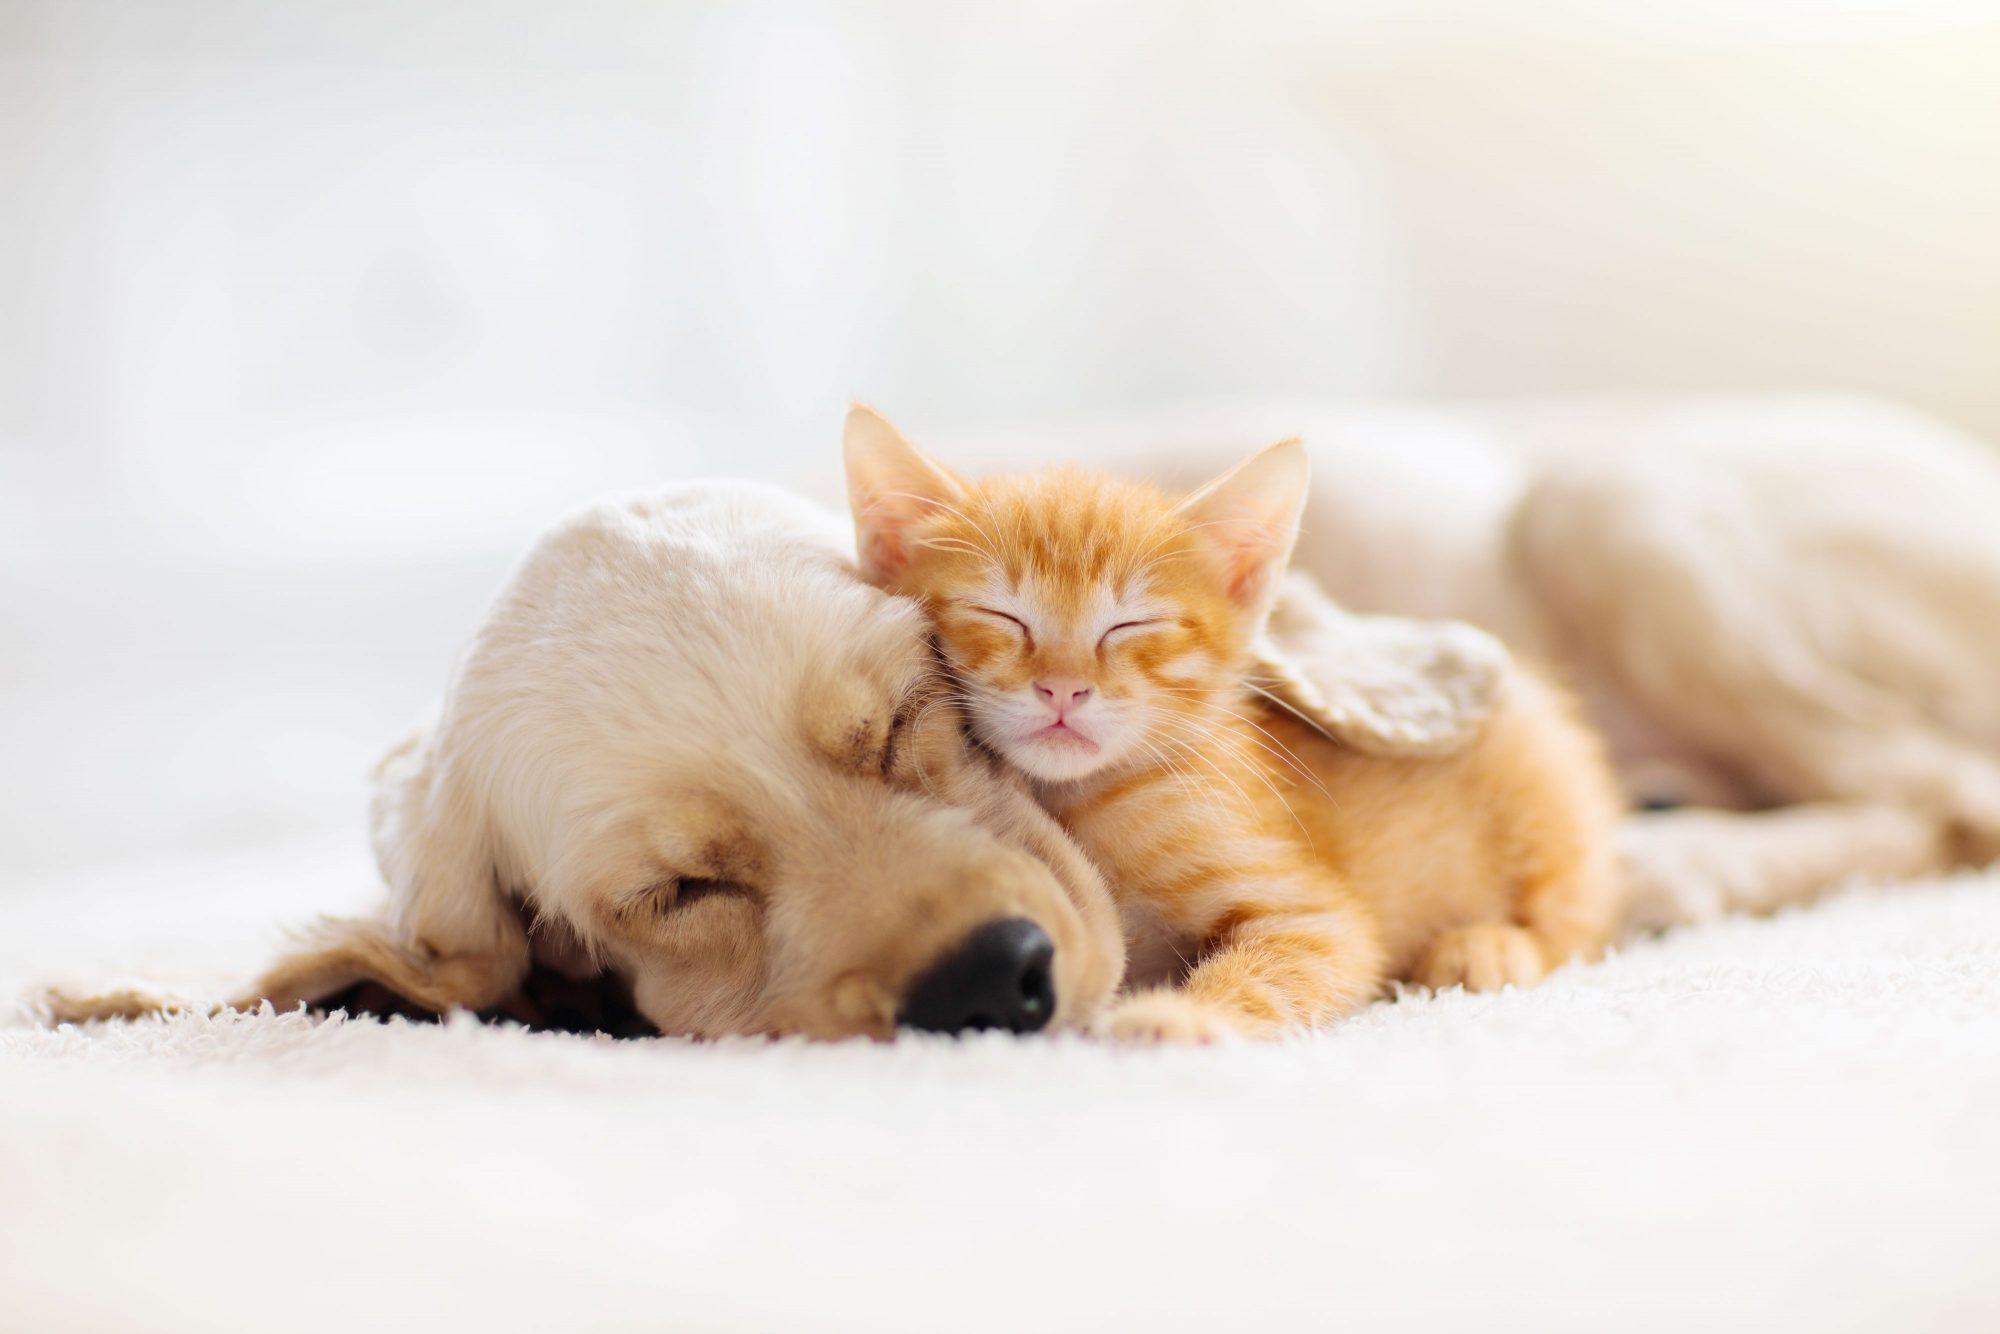 Cat and dog sleeping.